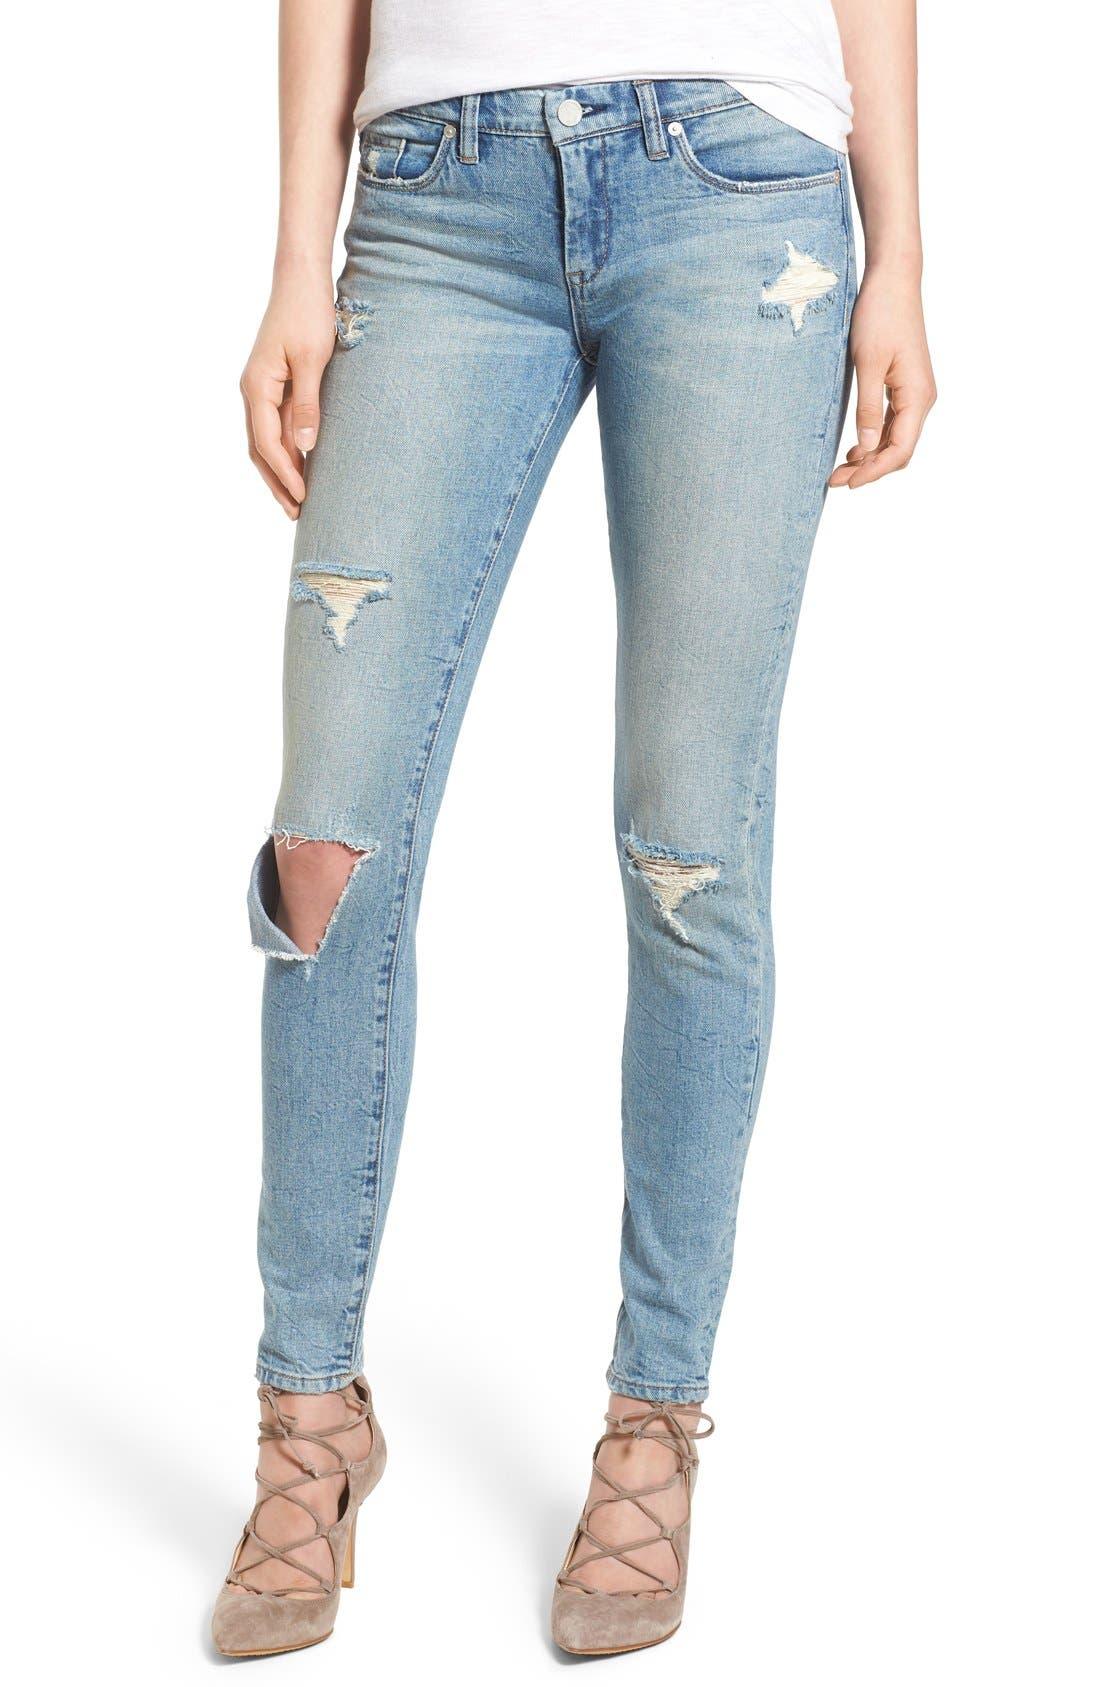 BLANKNYC 'Skinny Dipper' Distressed Skinny Jeans, Main, color, 400